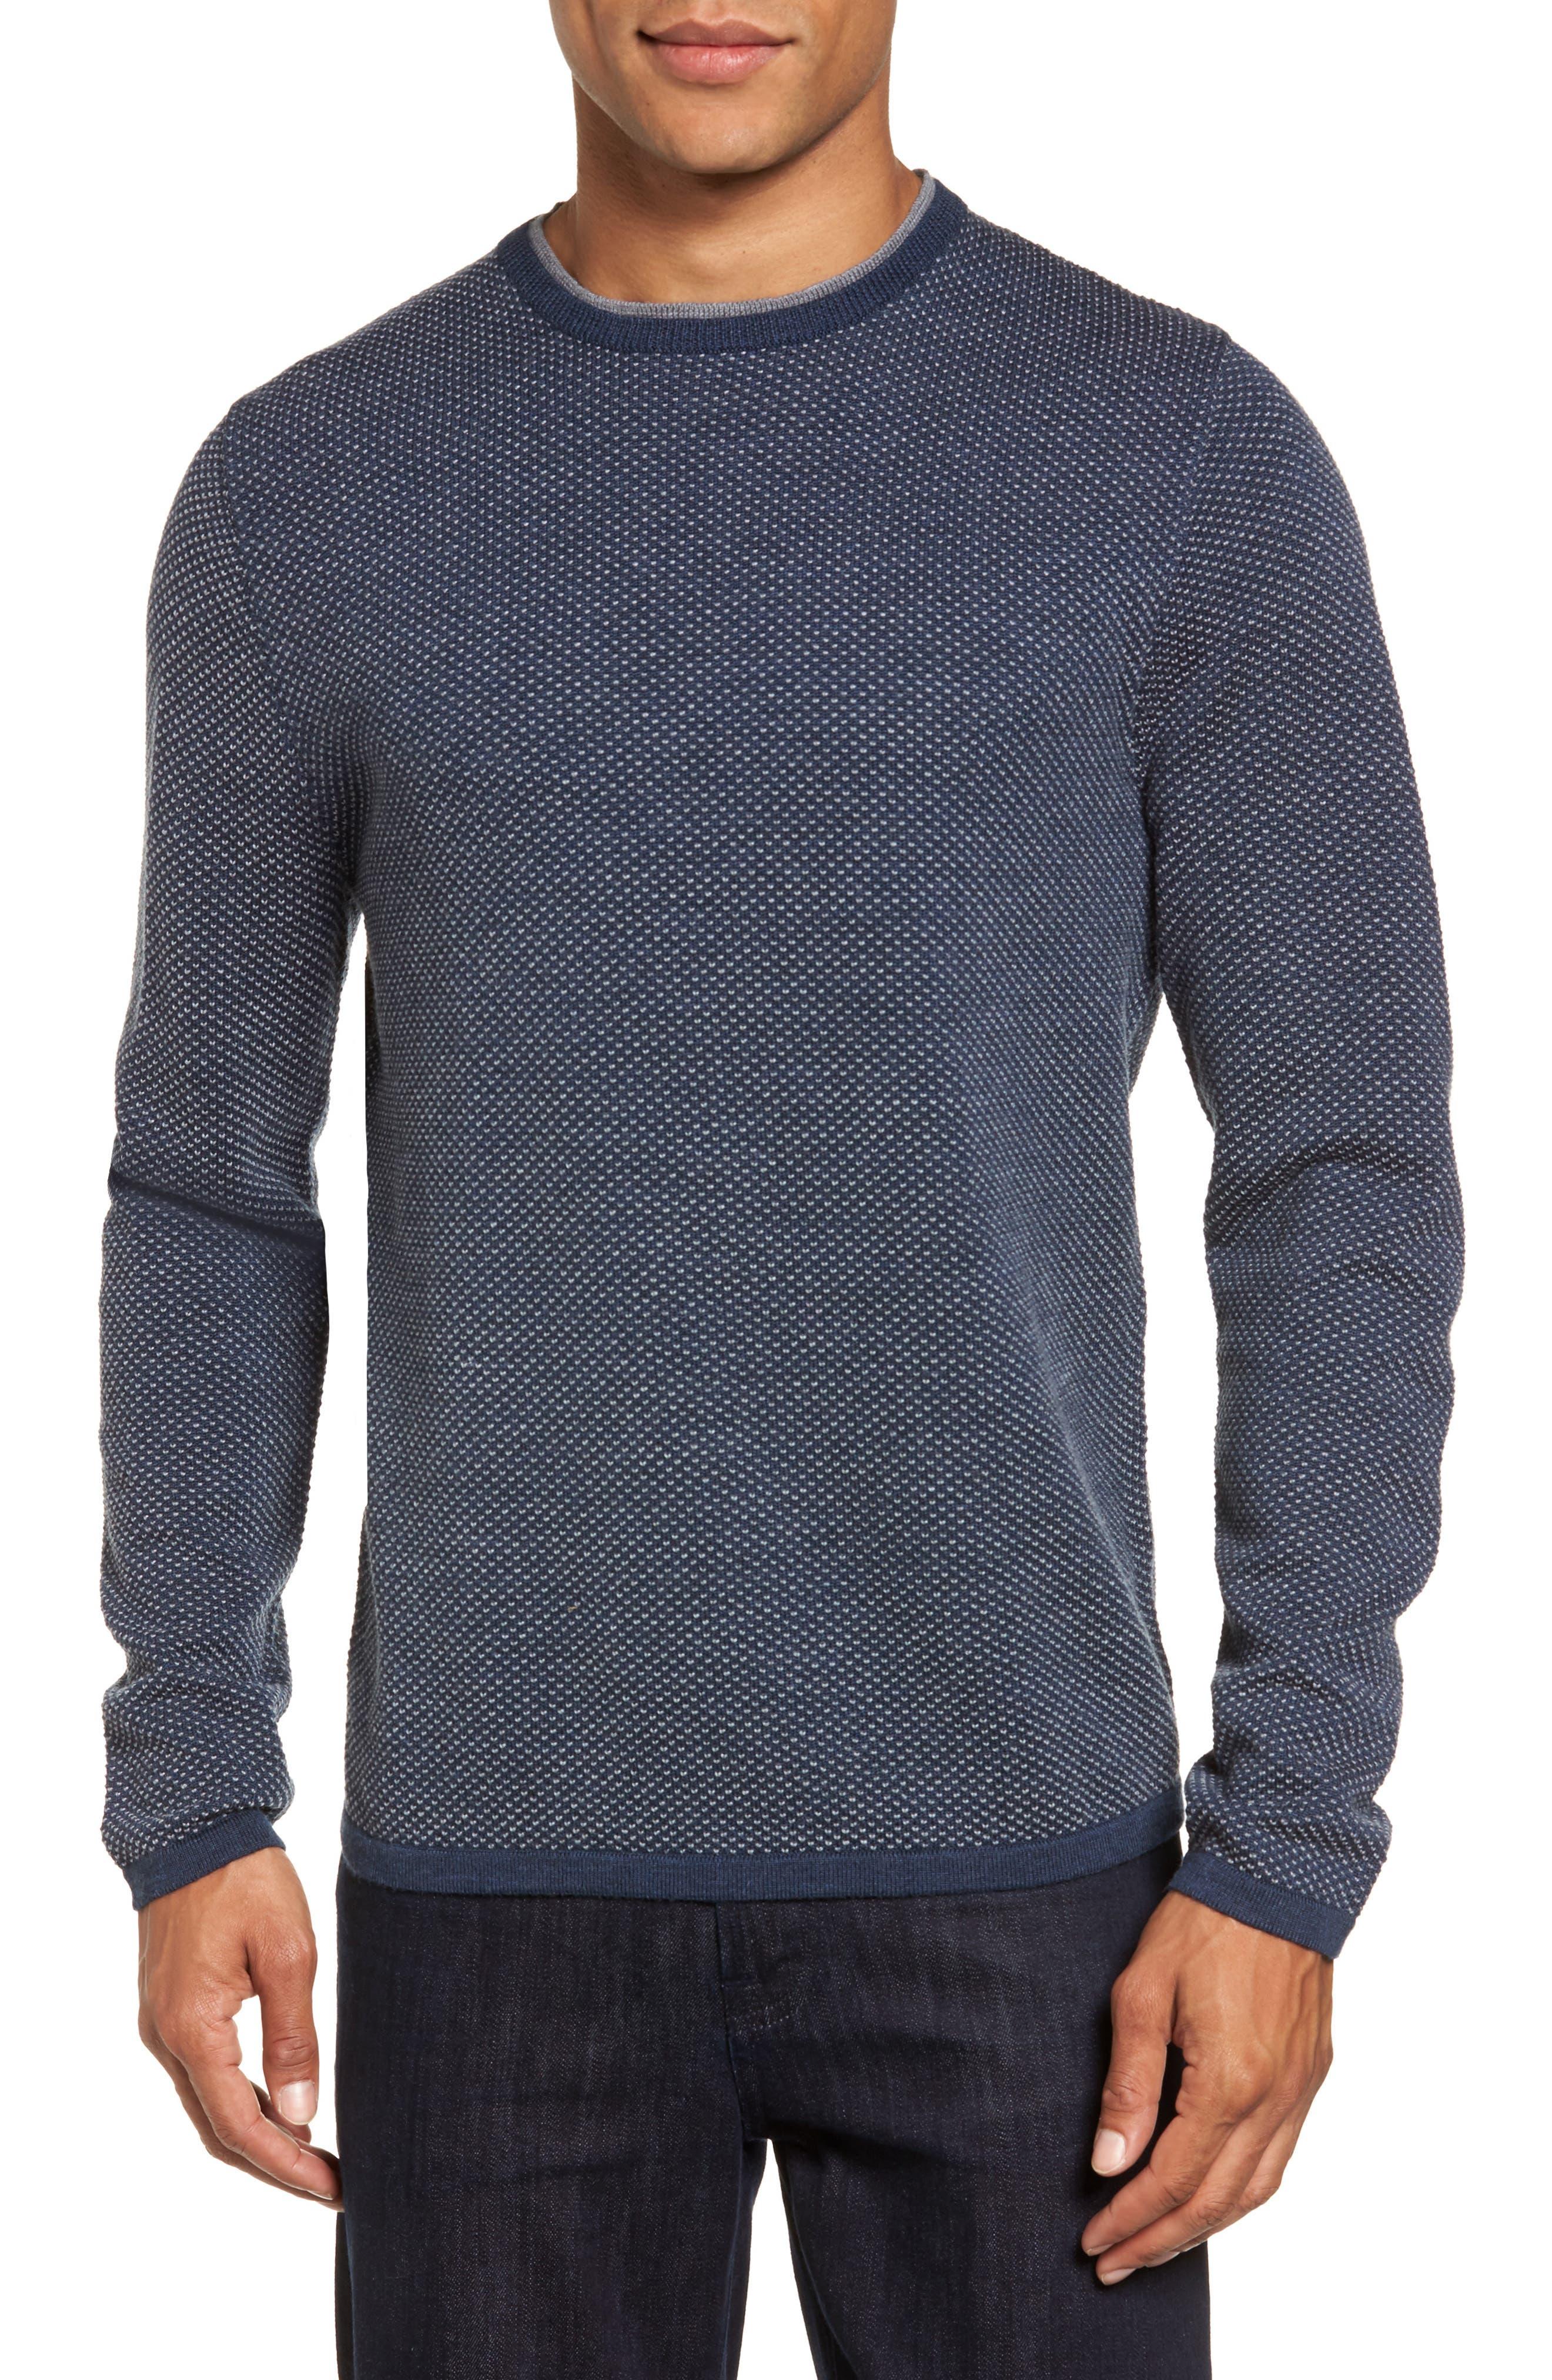 Main Image - Nordstrom Men's Shop Crewneck Knit Sweater (Tall)